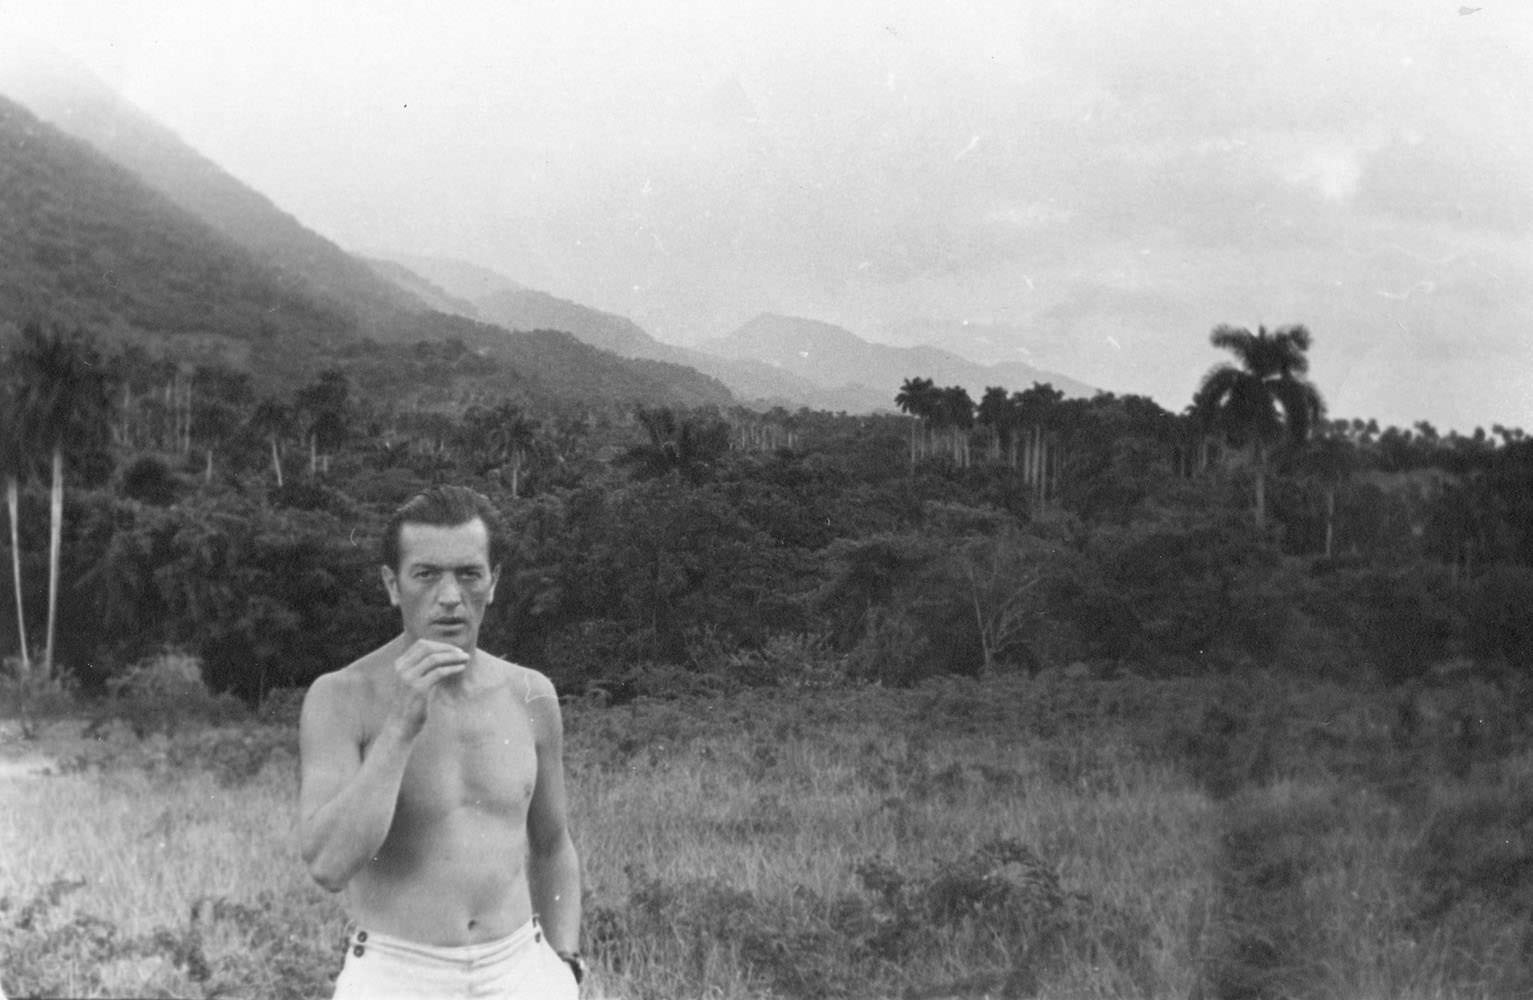 Барбаков Н.Т. на Кубе. Фото 1.